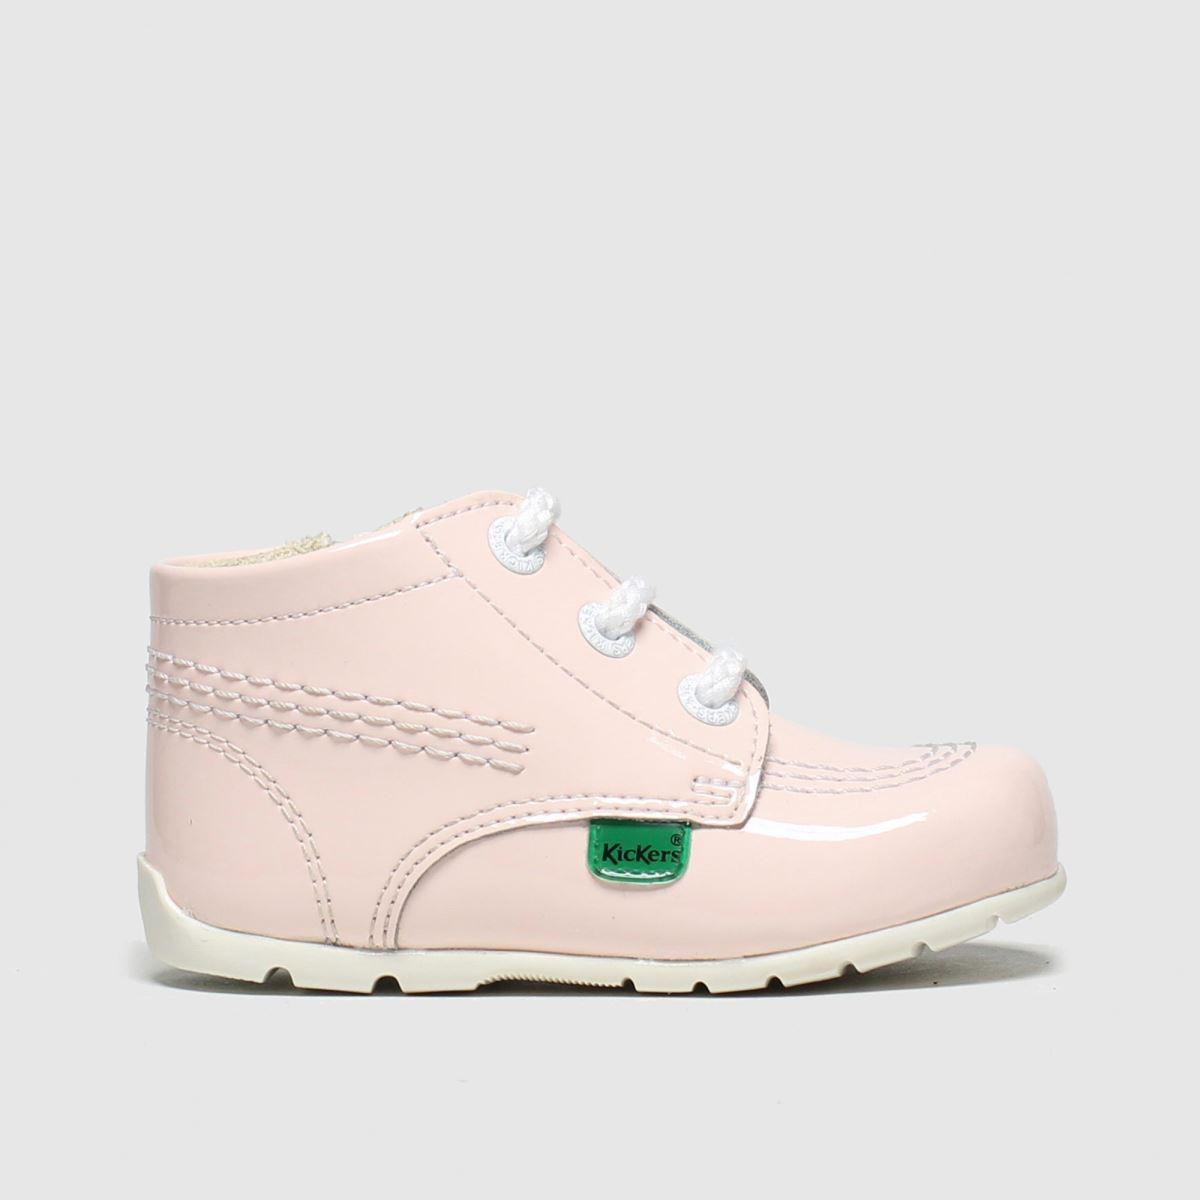 Kickers Pale Pink Hi B Zip Patl Shoes Baby